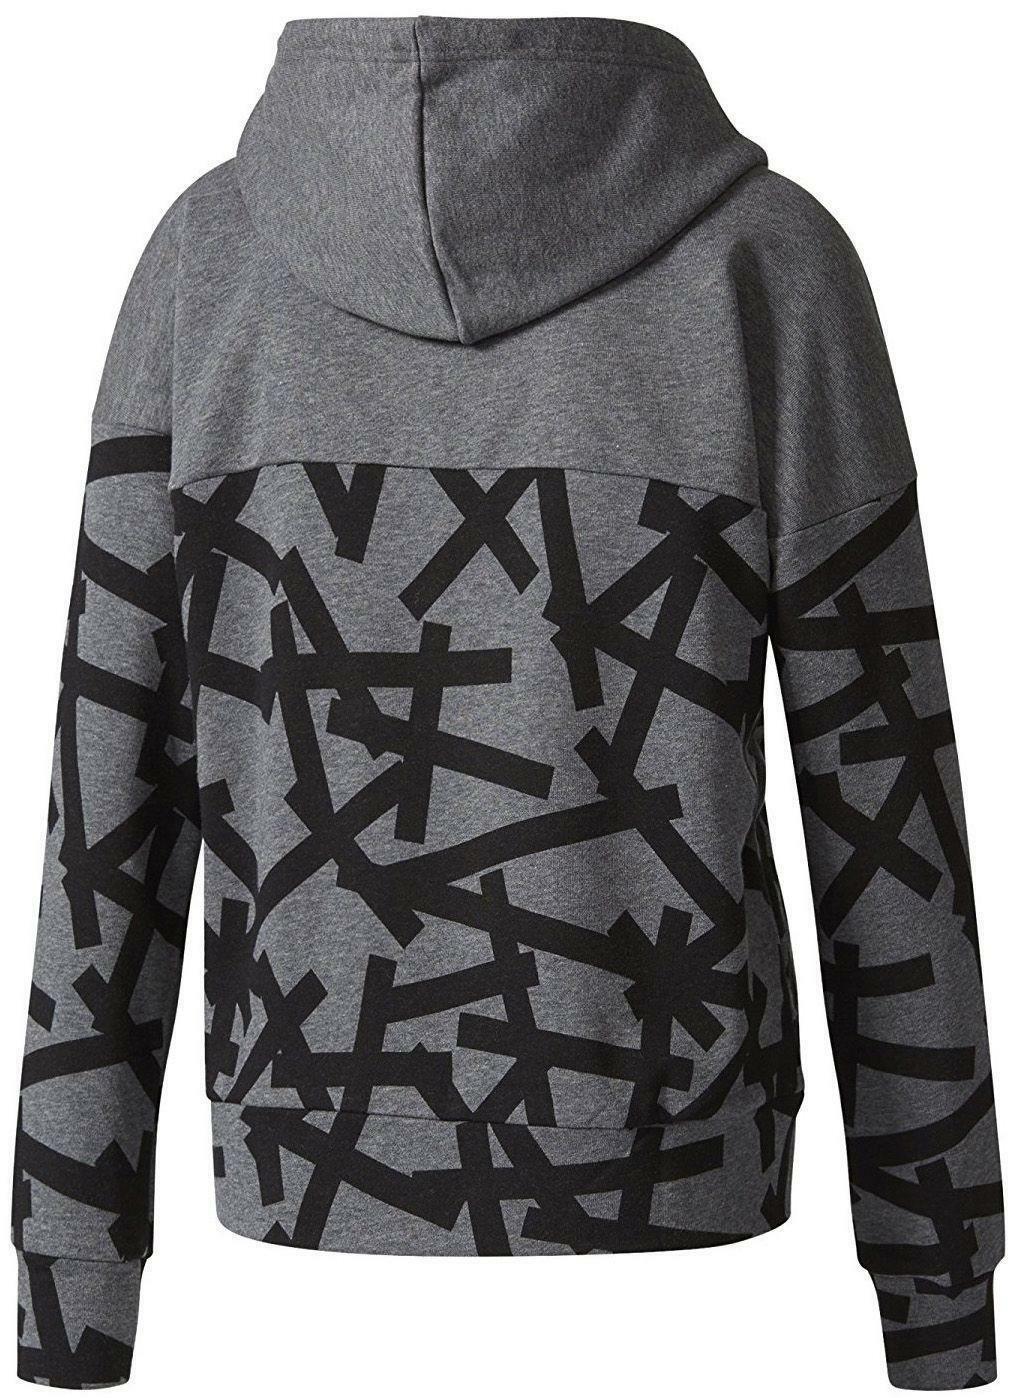 adidas adidas aop hoodie giacchetto donna grigio